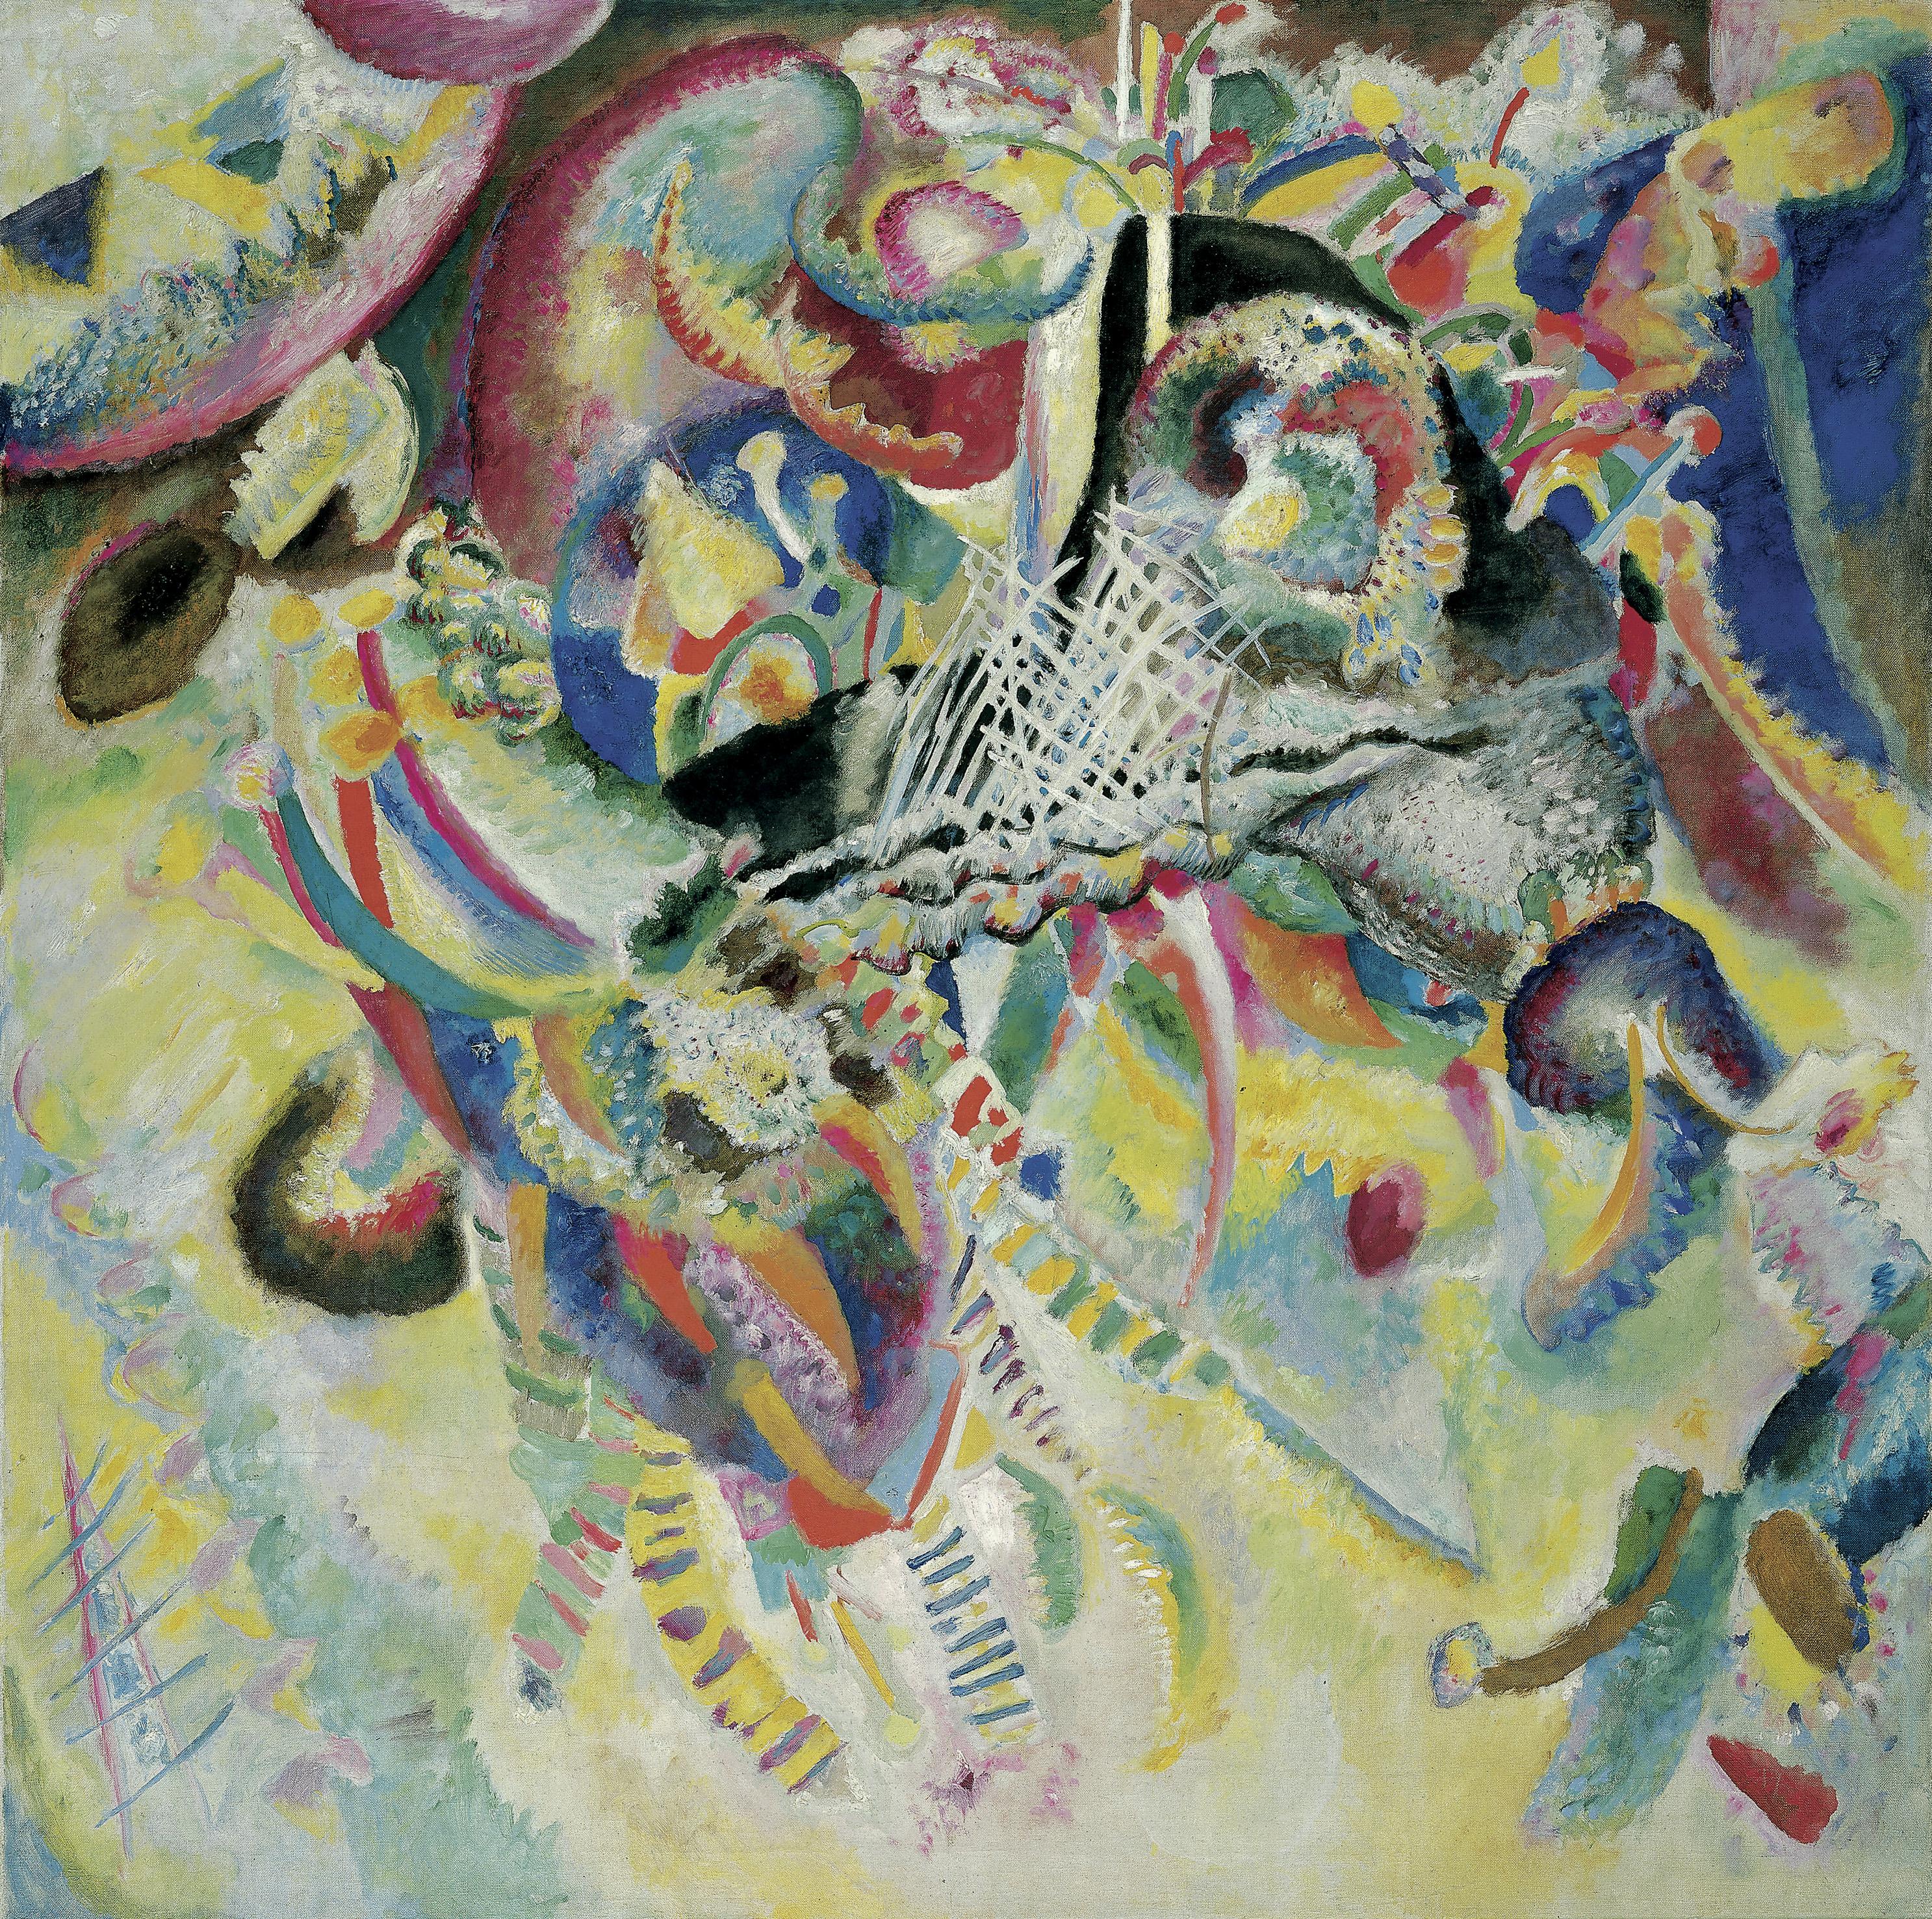 Kandinsky, Marc & Der Blaue Reiter; Vassily Kandinsky, Fuga, 1914; Öl auf Leinwand; 129,5 x 129,5 cm; Fondation Beyeler, Riehen/Basel, Sammlung Beyeler; Foto: Robert Bayer, Basel